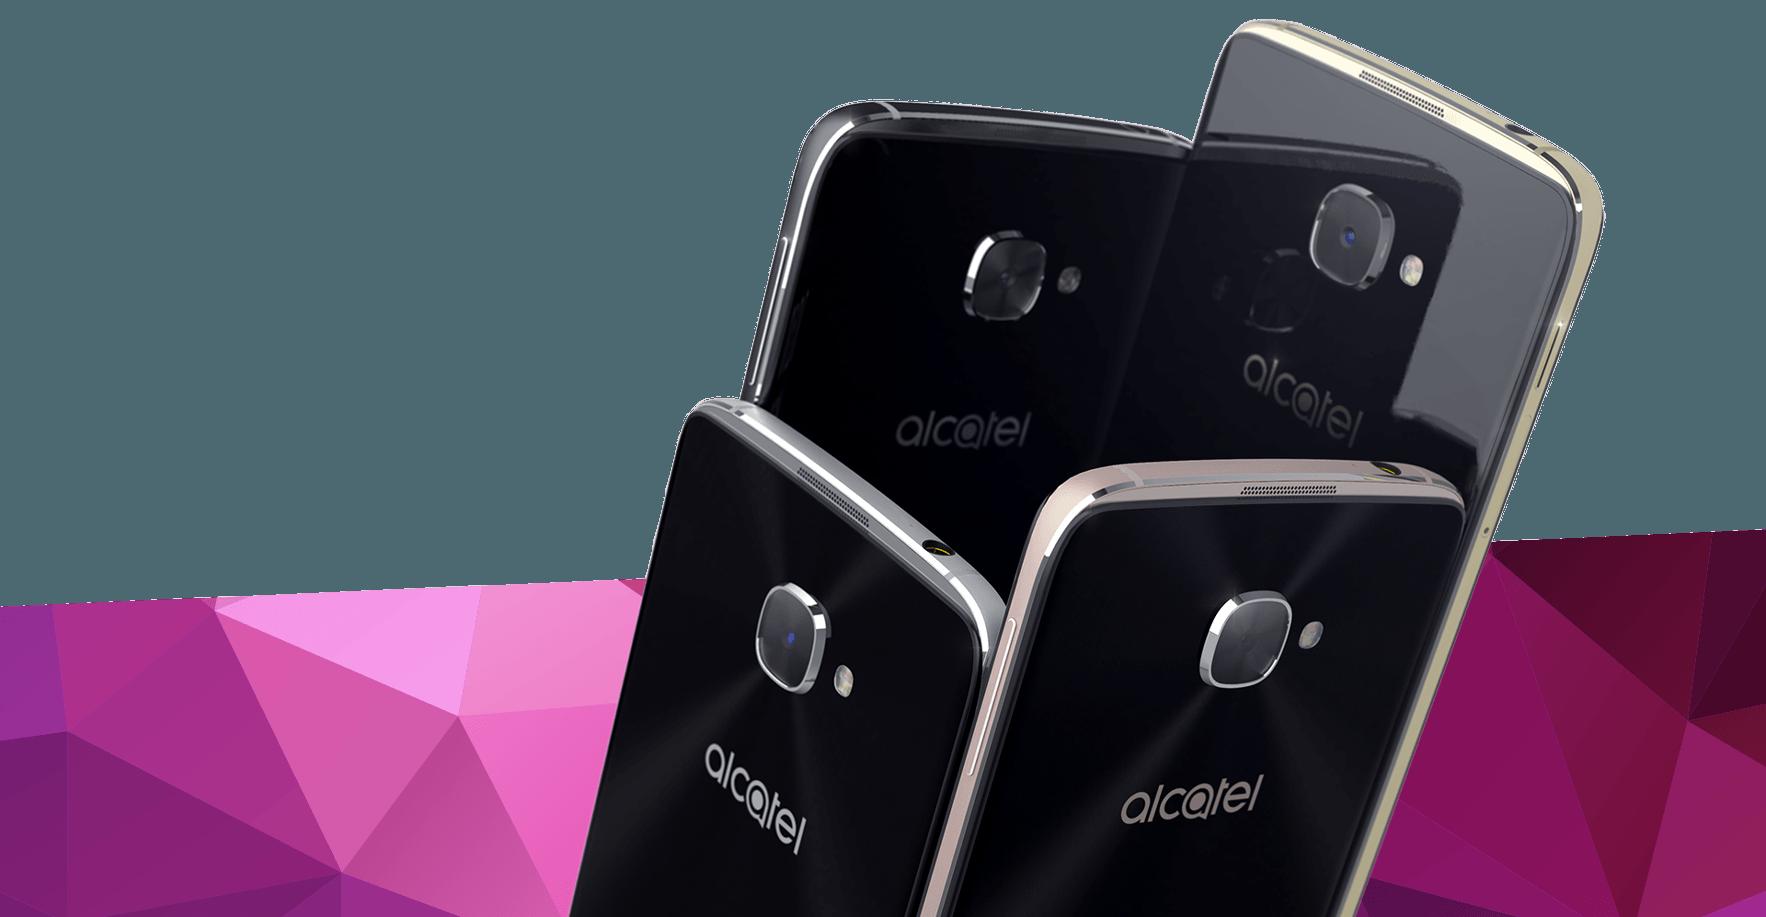 Alcatel Idol 4 detalle cámara